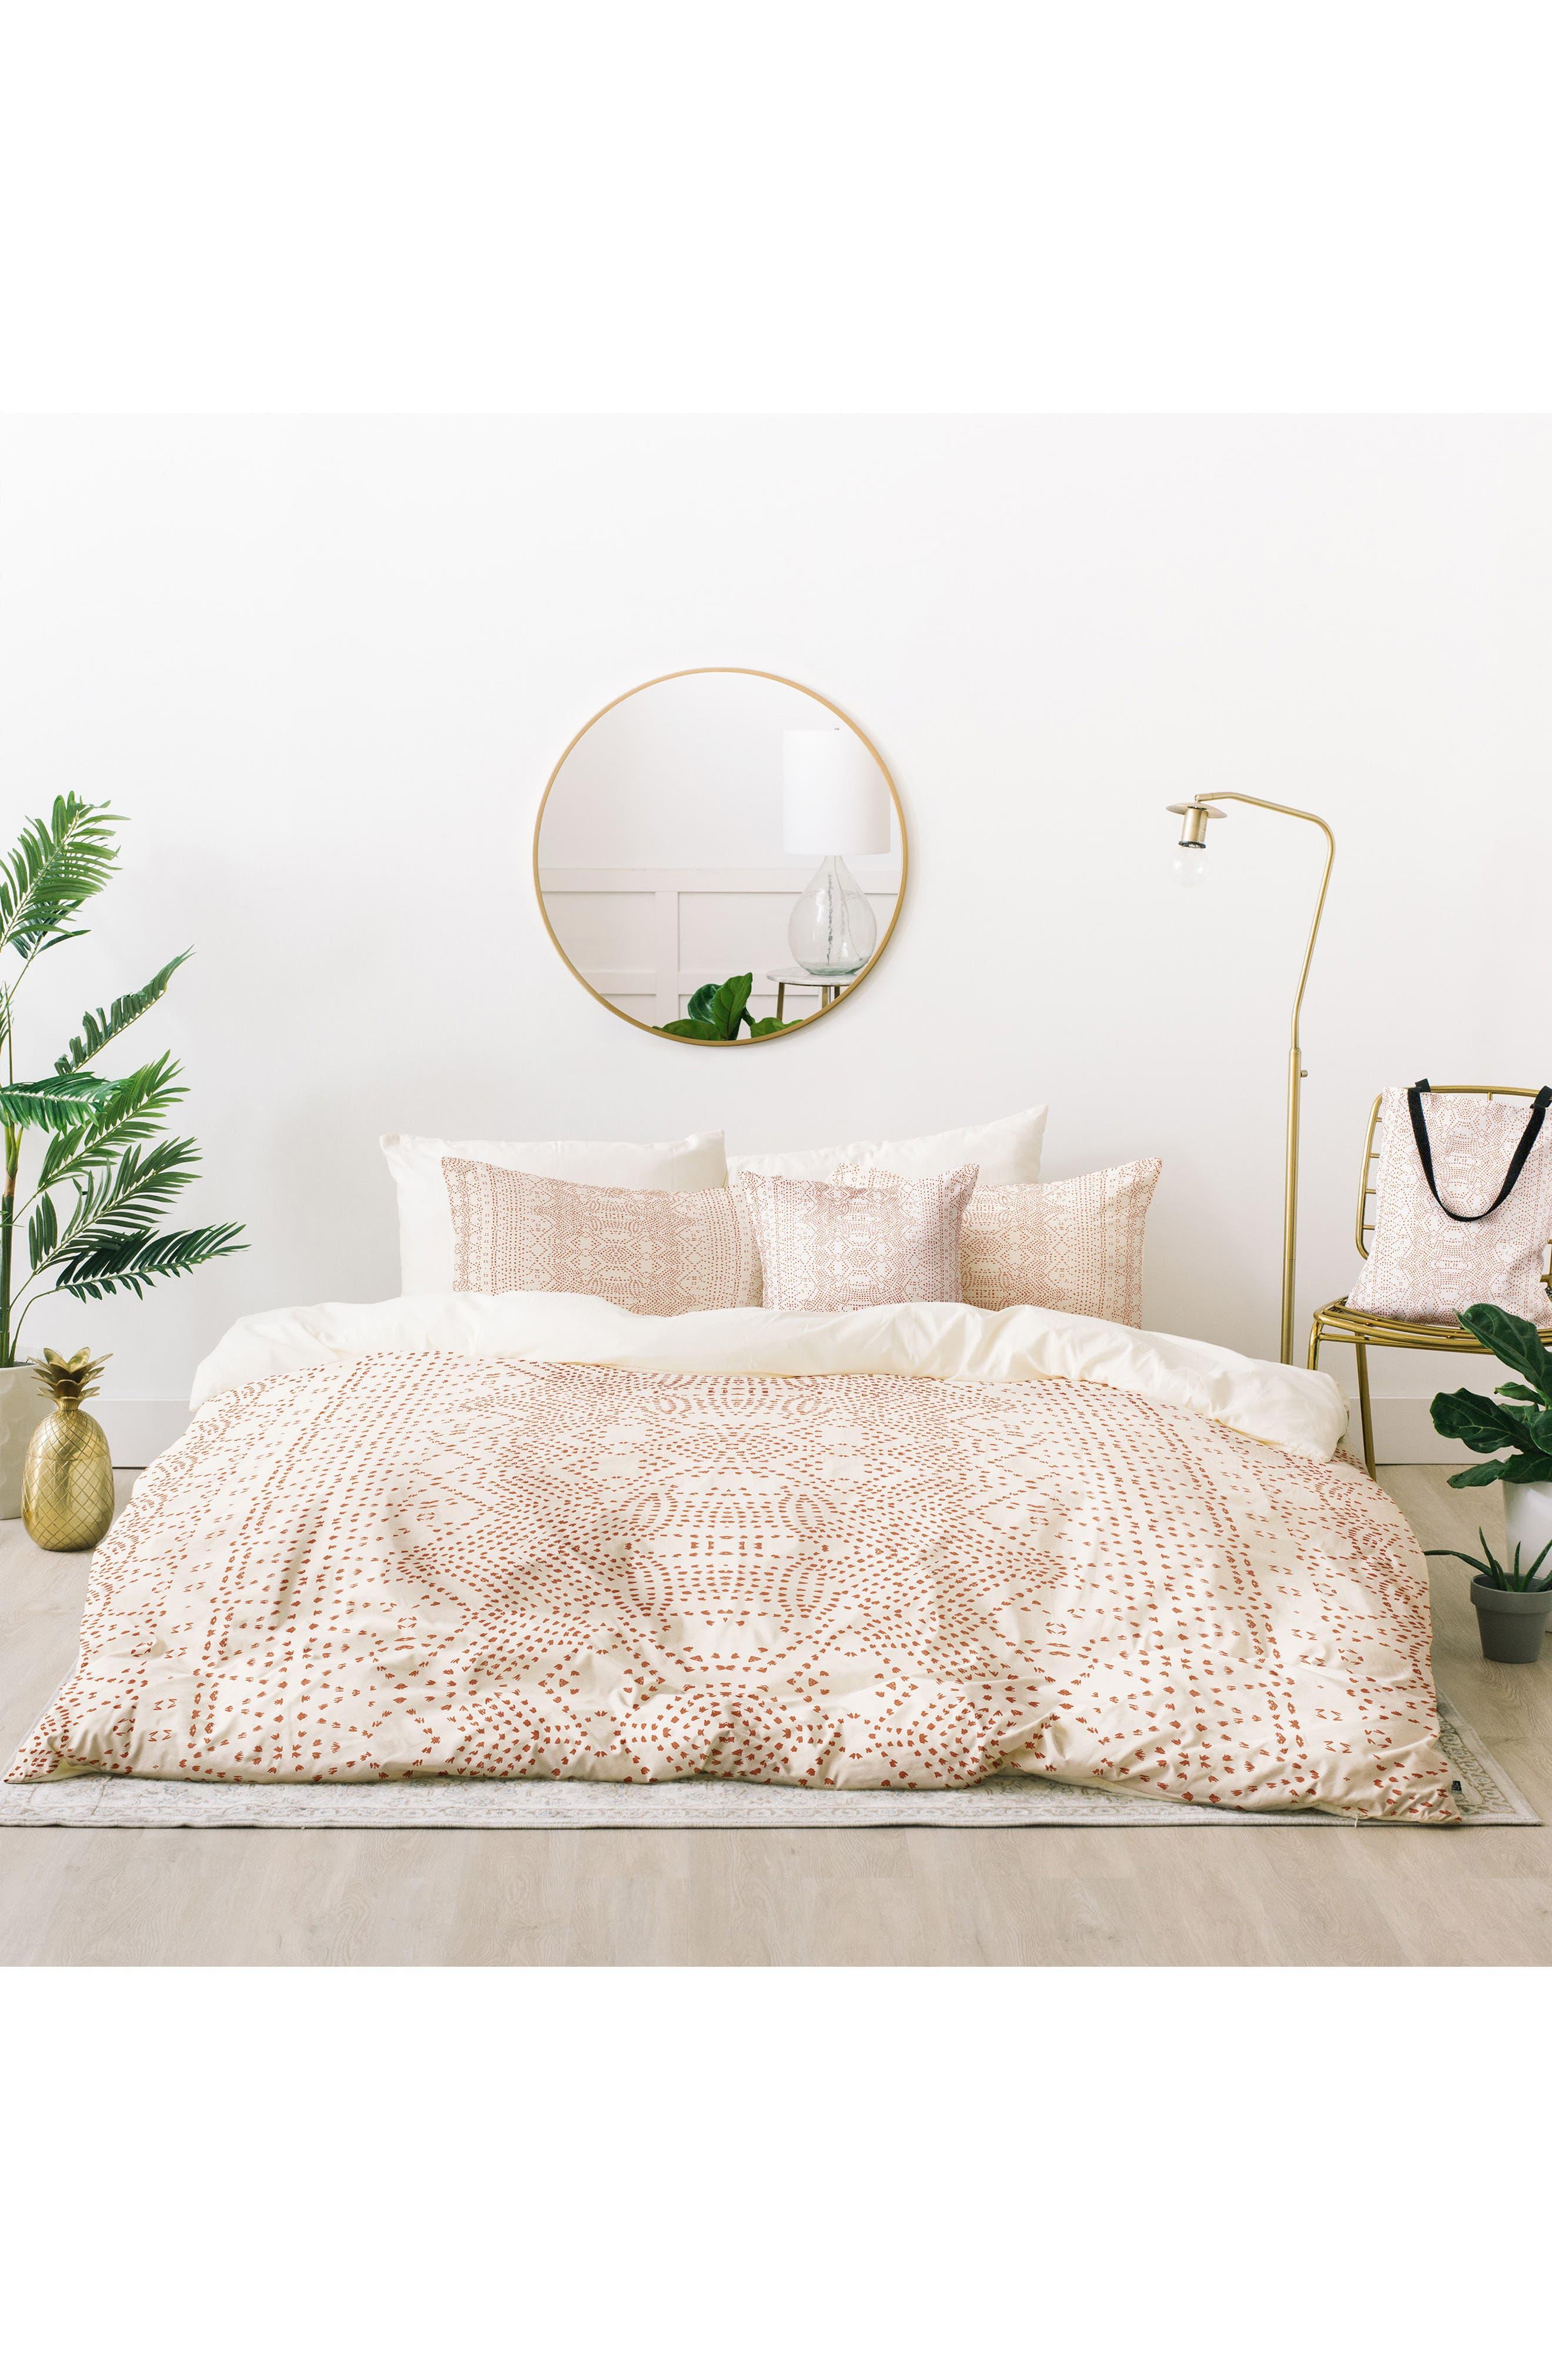 Holli Zollinger Marrakeshi Bed in a Bag Duvet Cover, Sham & Accent Pillow Set,                             Main thumbnail 1, color,                             800